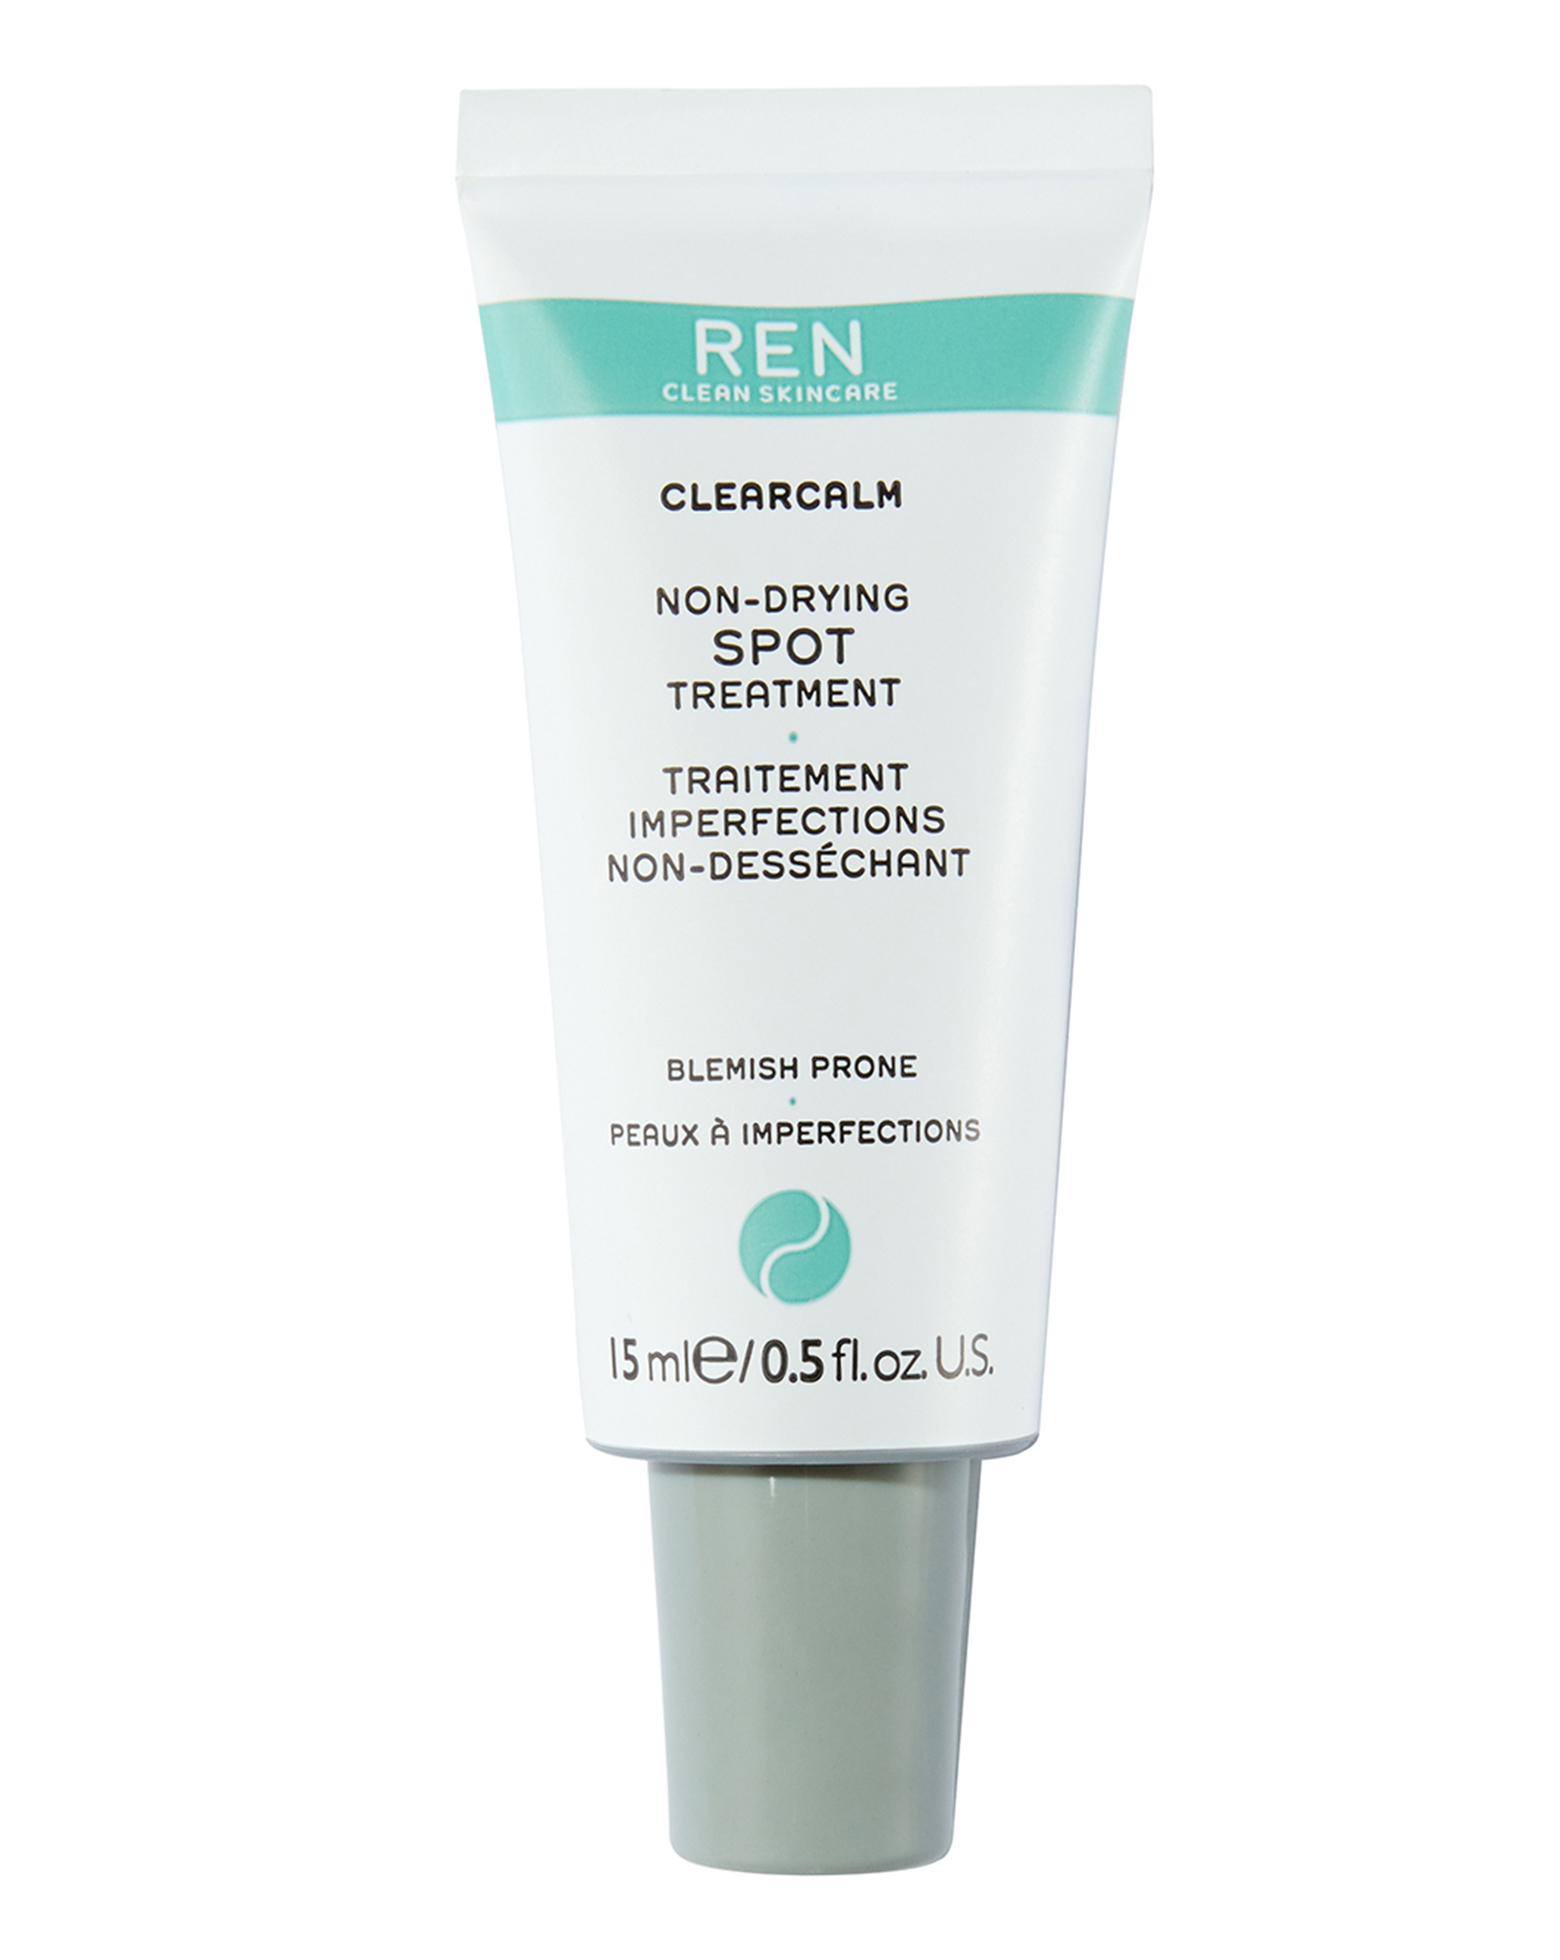 REN ClearCalm Non-Drying Spot Treatment